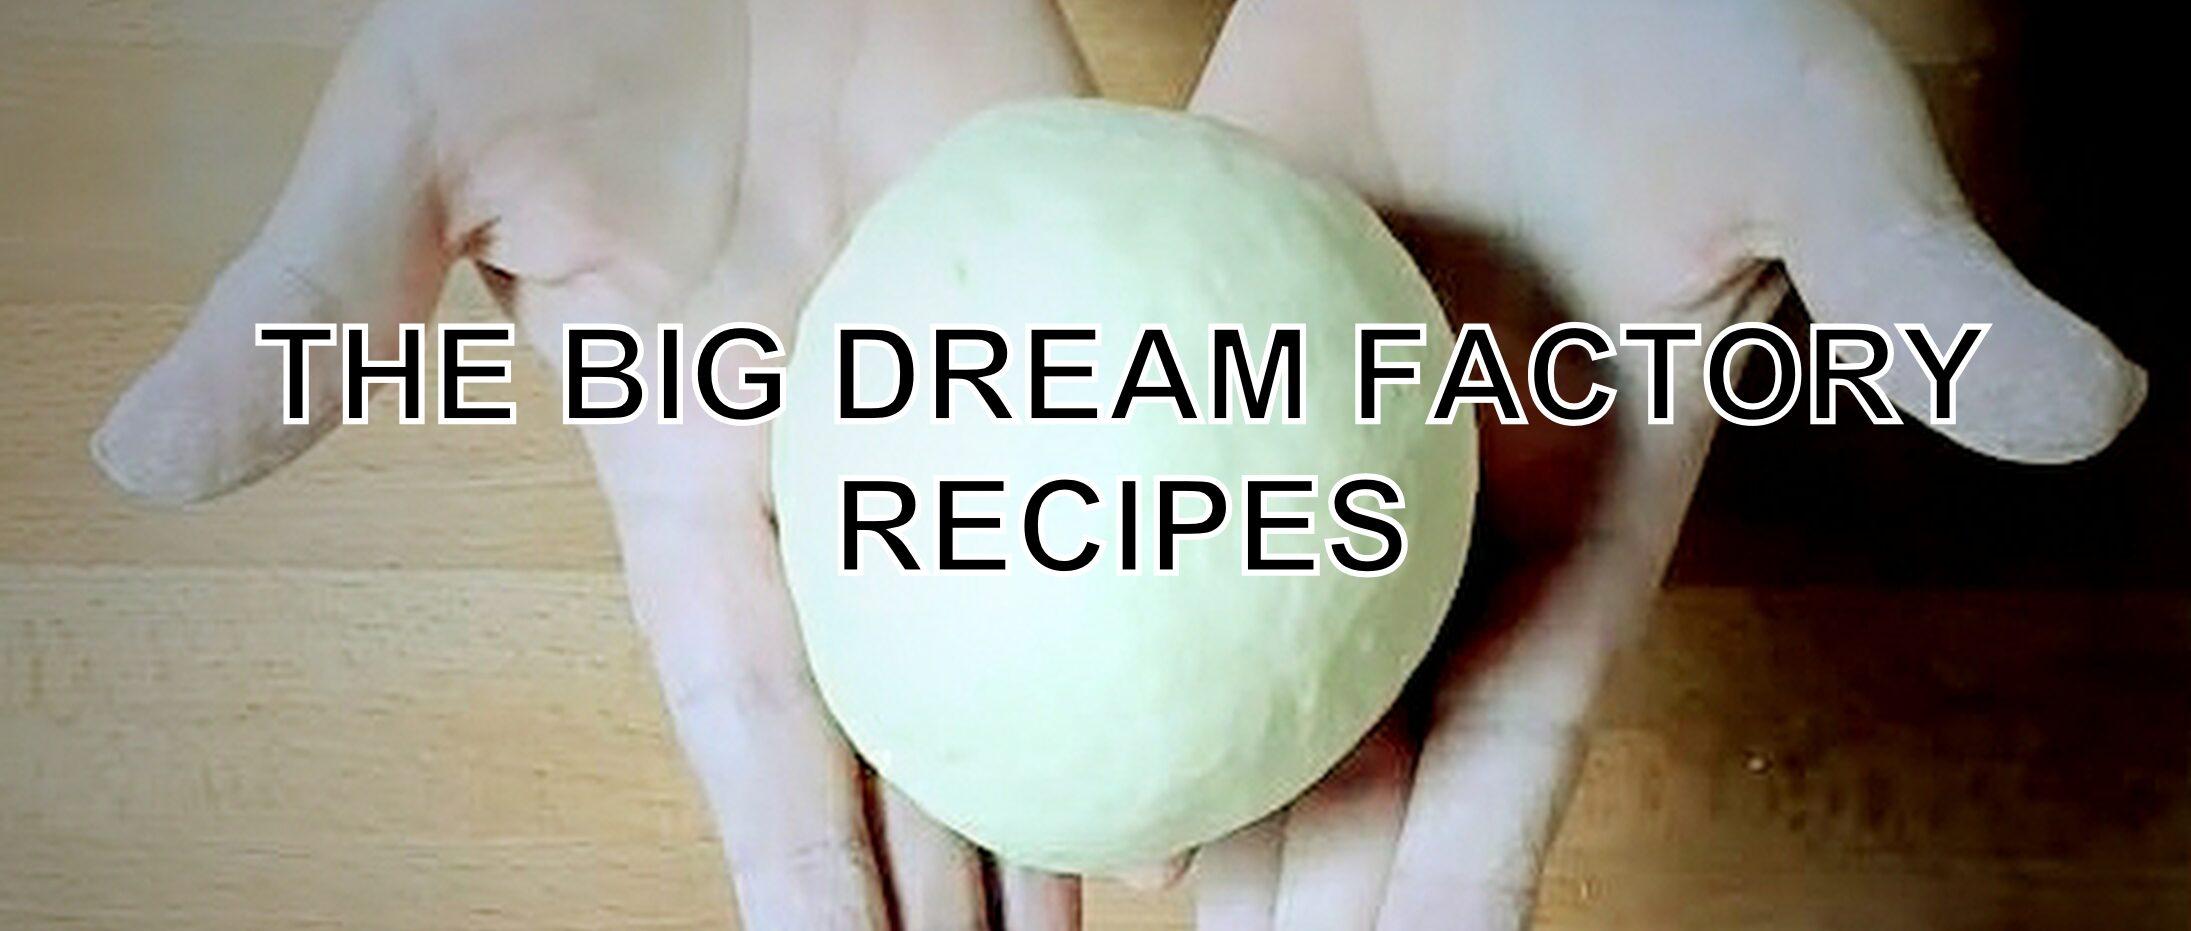 The Big Dream Factory RECIPES